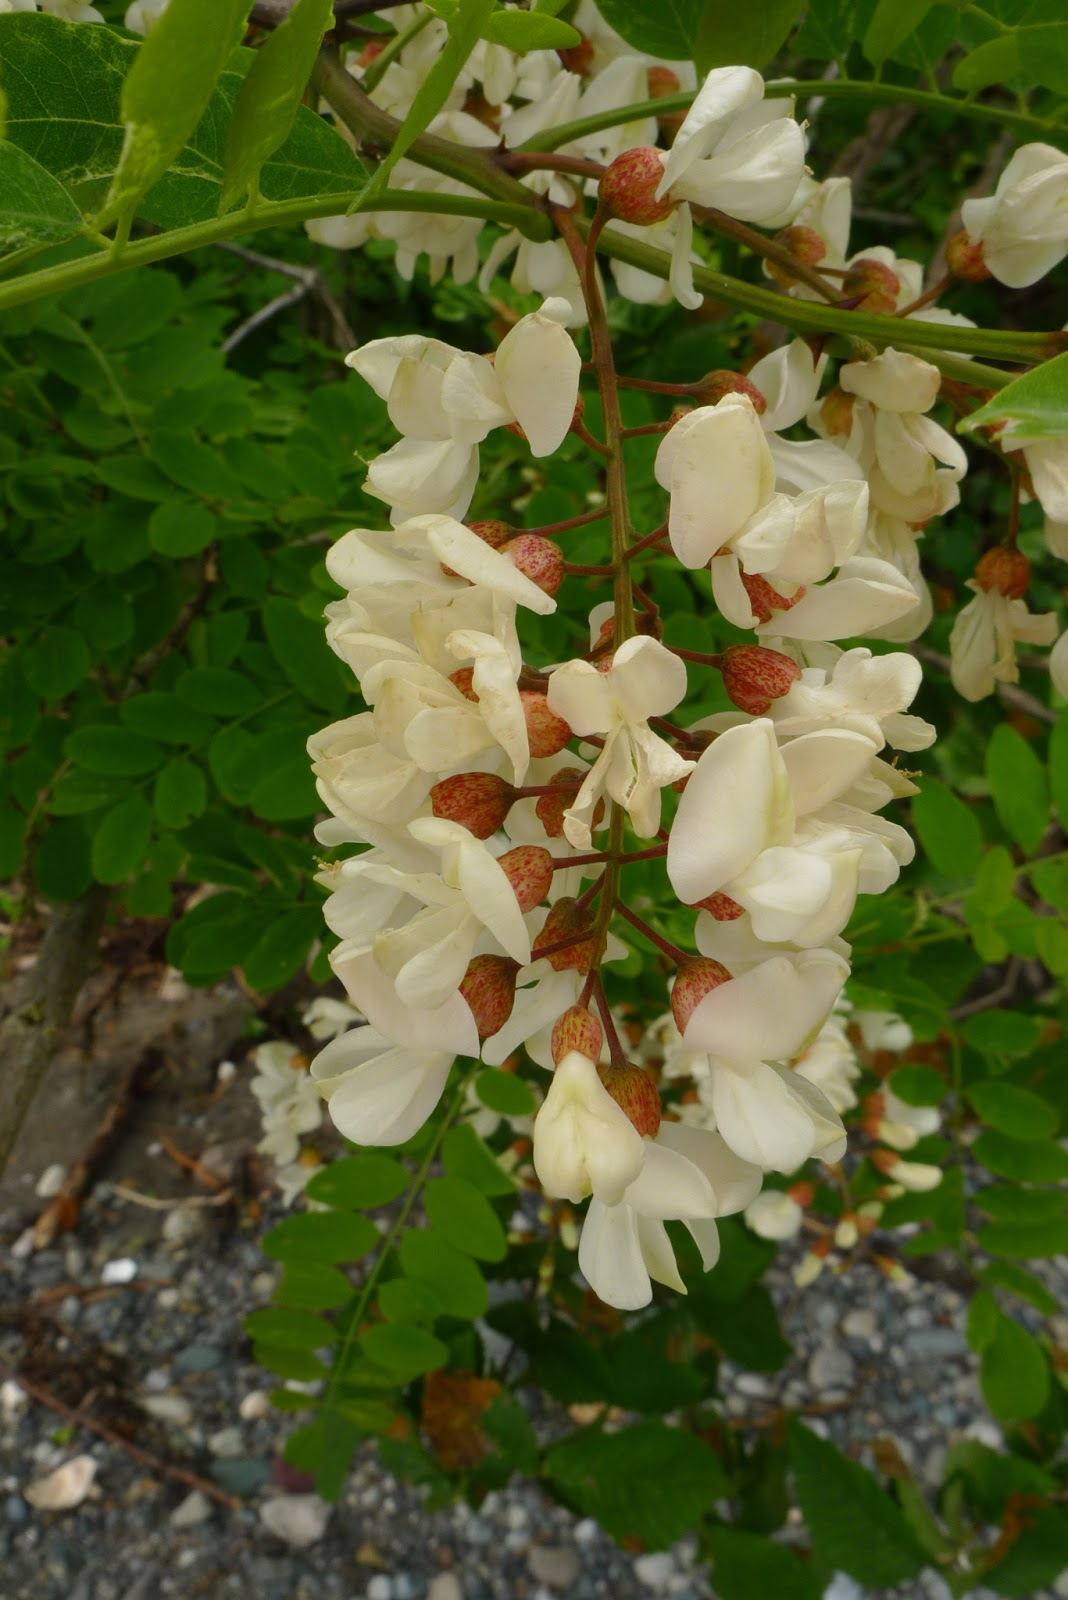 Wild Harvests Black Locust Flowers